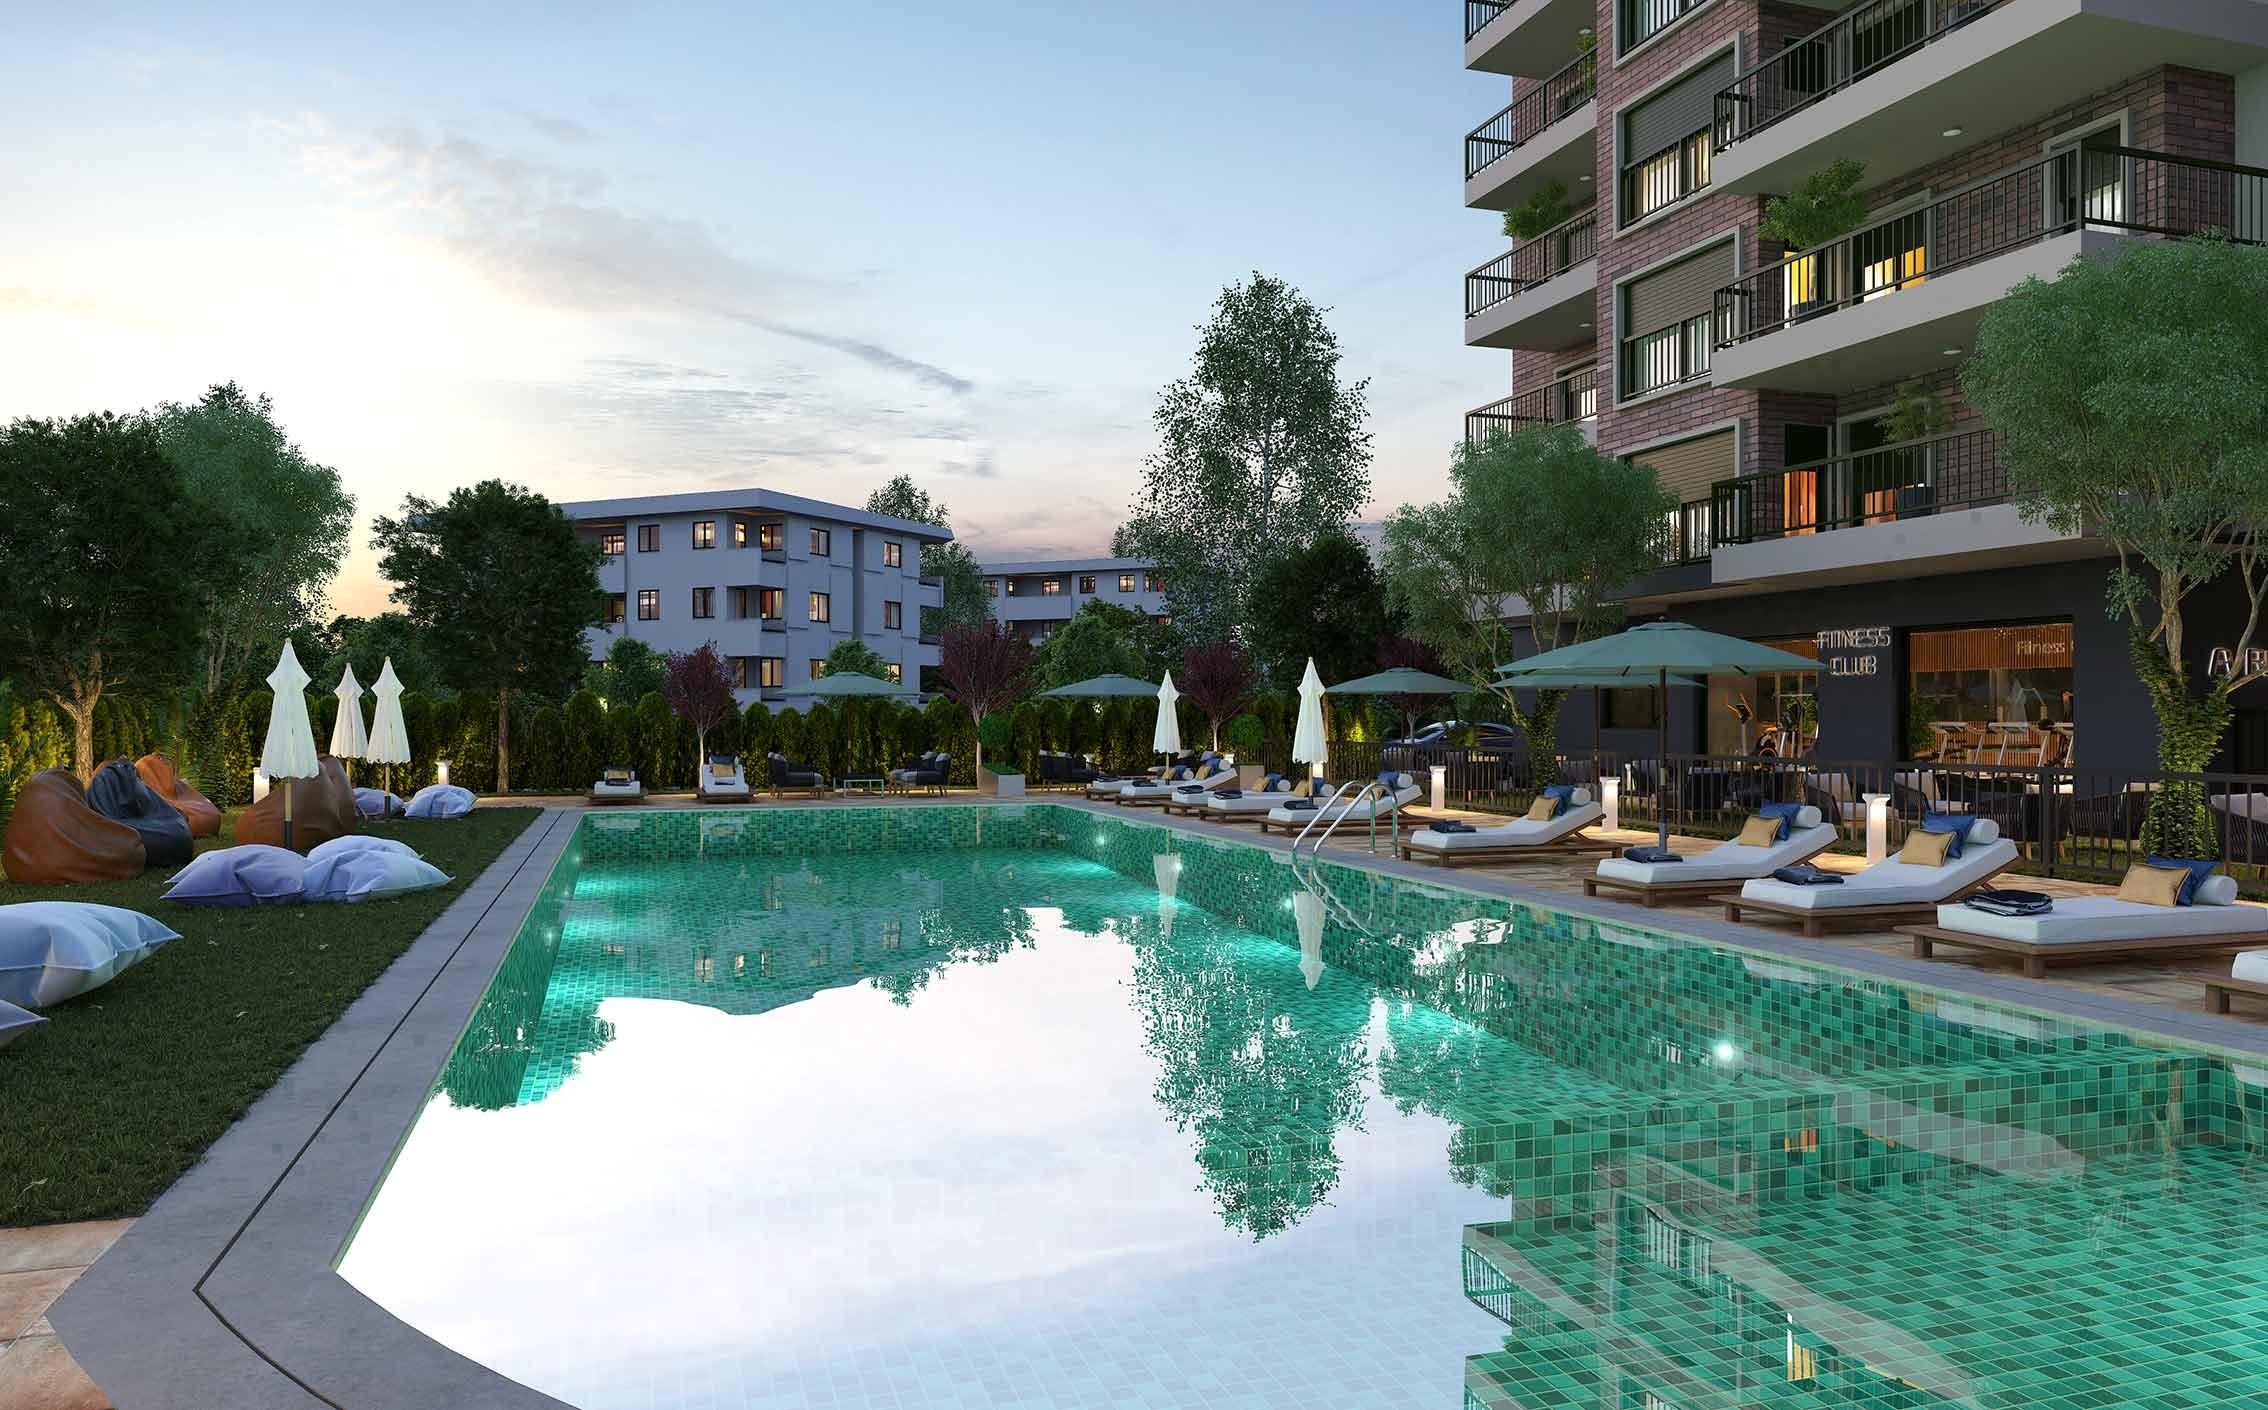 Siena Garden - İzmir